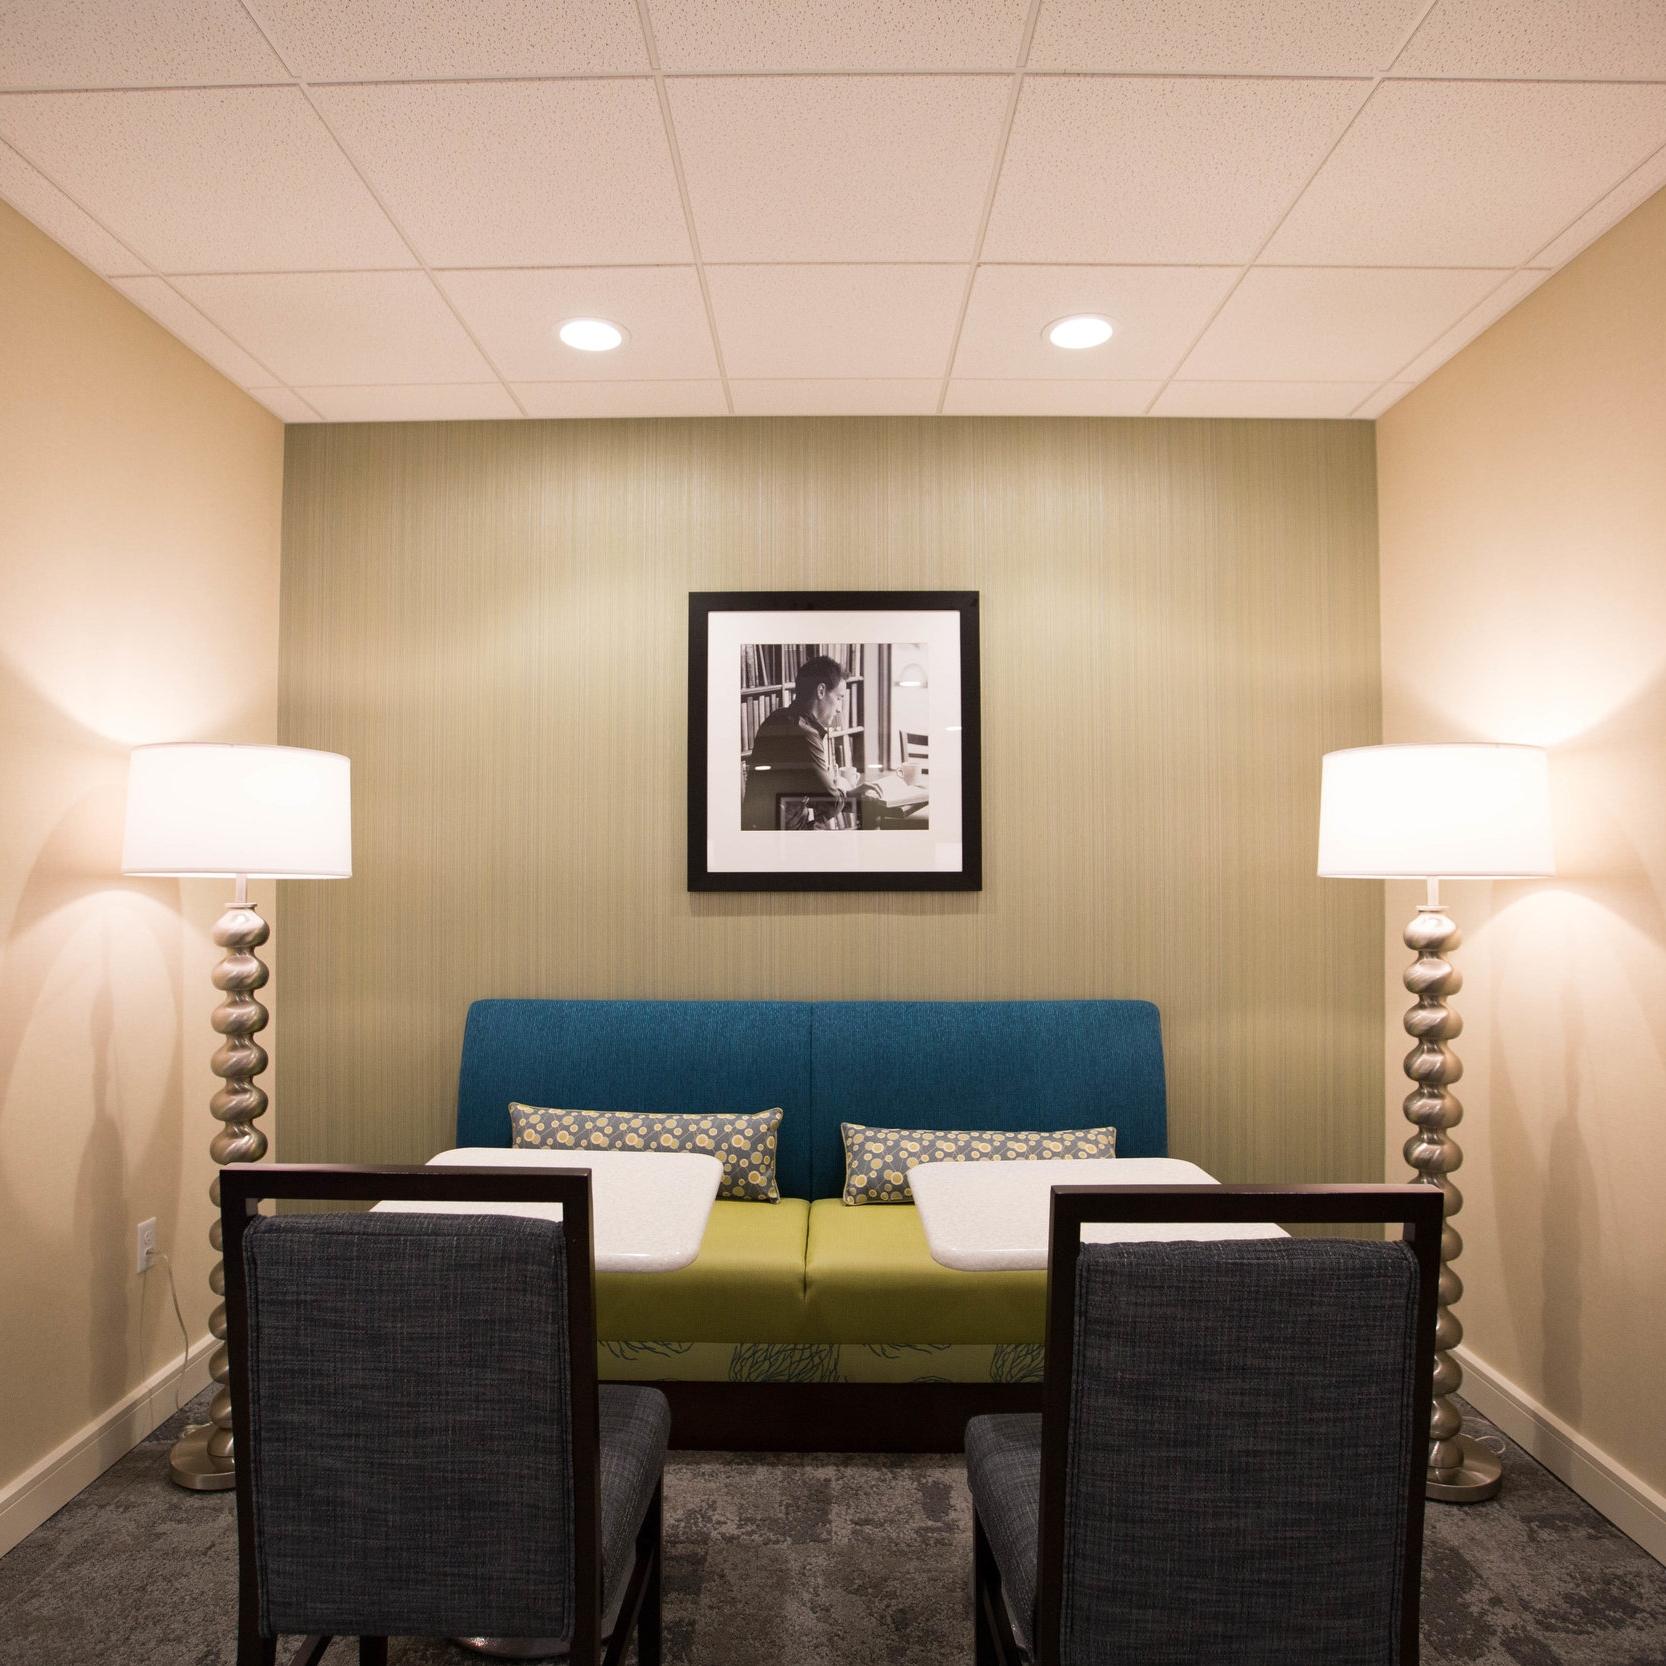 Hampton Inn Amesbury   New Hotel 92 Guest Rooms Contractor: Opechee Amesbury, Massachusetts